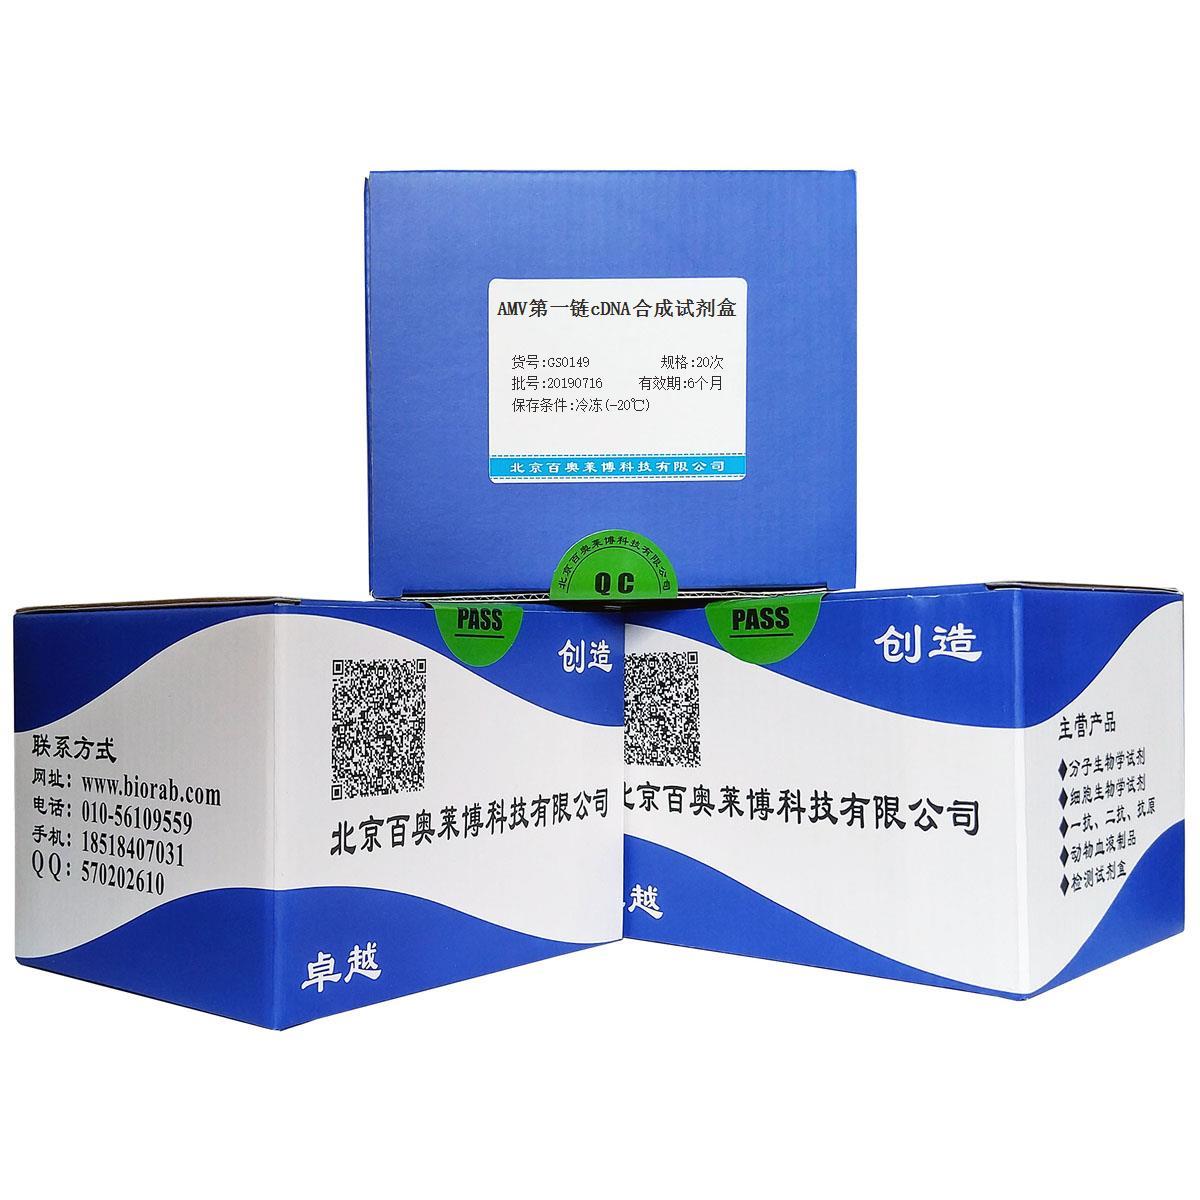 AMV第一链cDNA合成试剂盒北京厂家